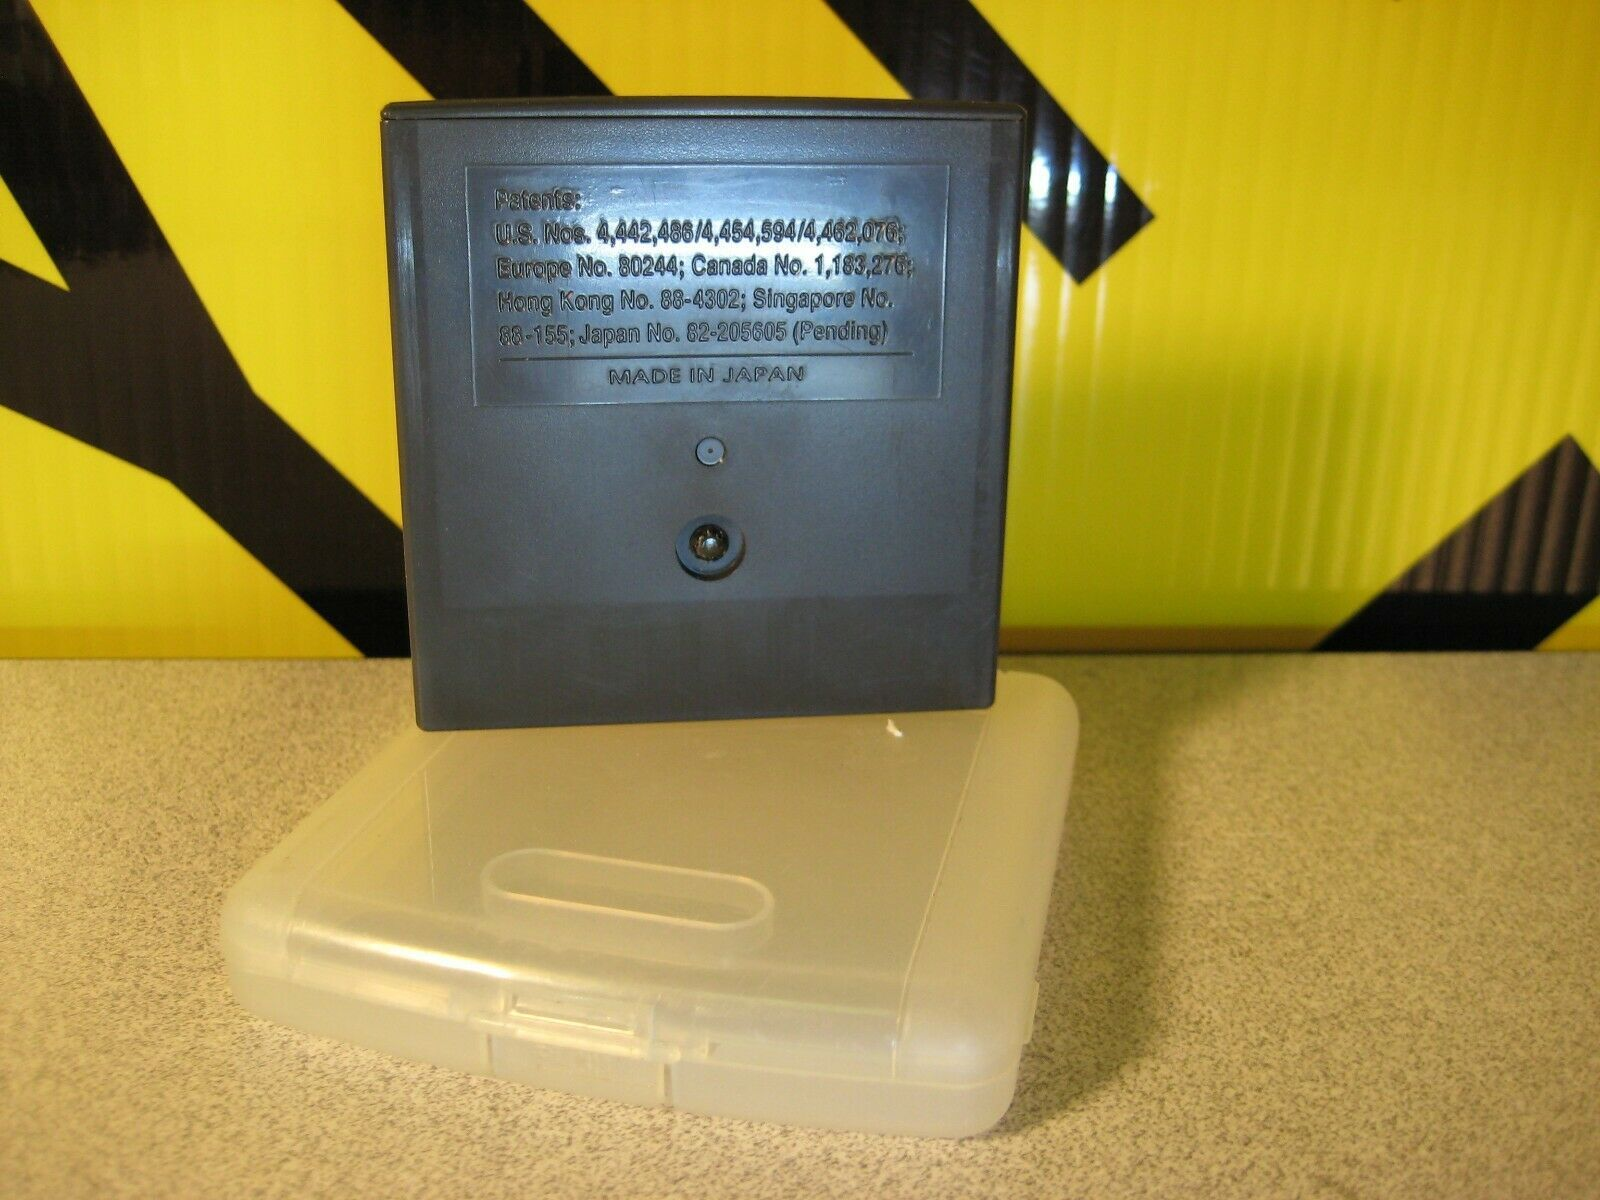 J.League GG Pro Striker 94 Sega Game Gear Cartridge with Case Soccer Football image 3